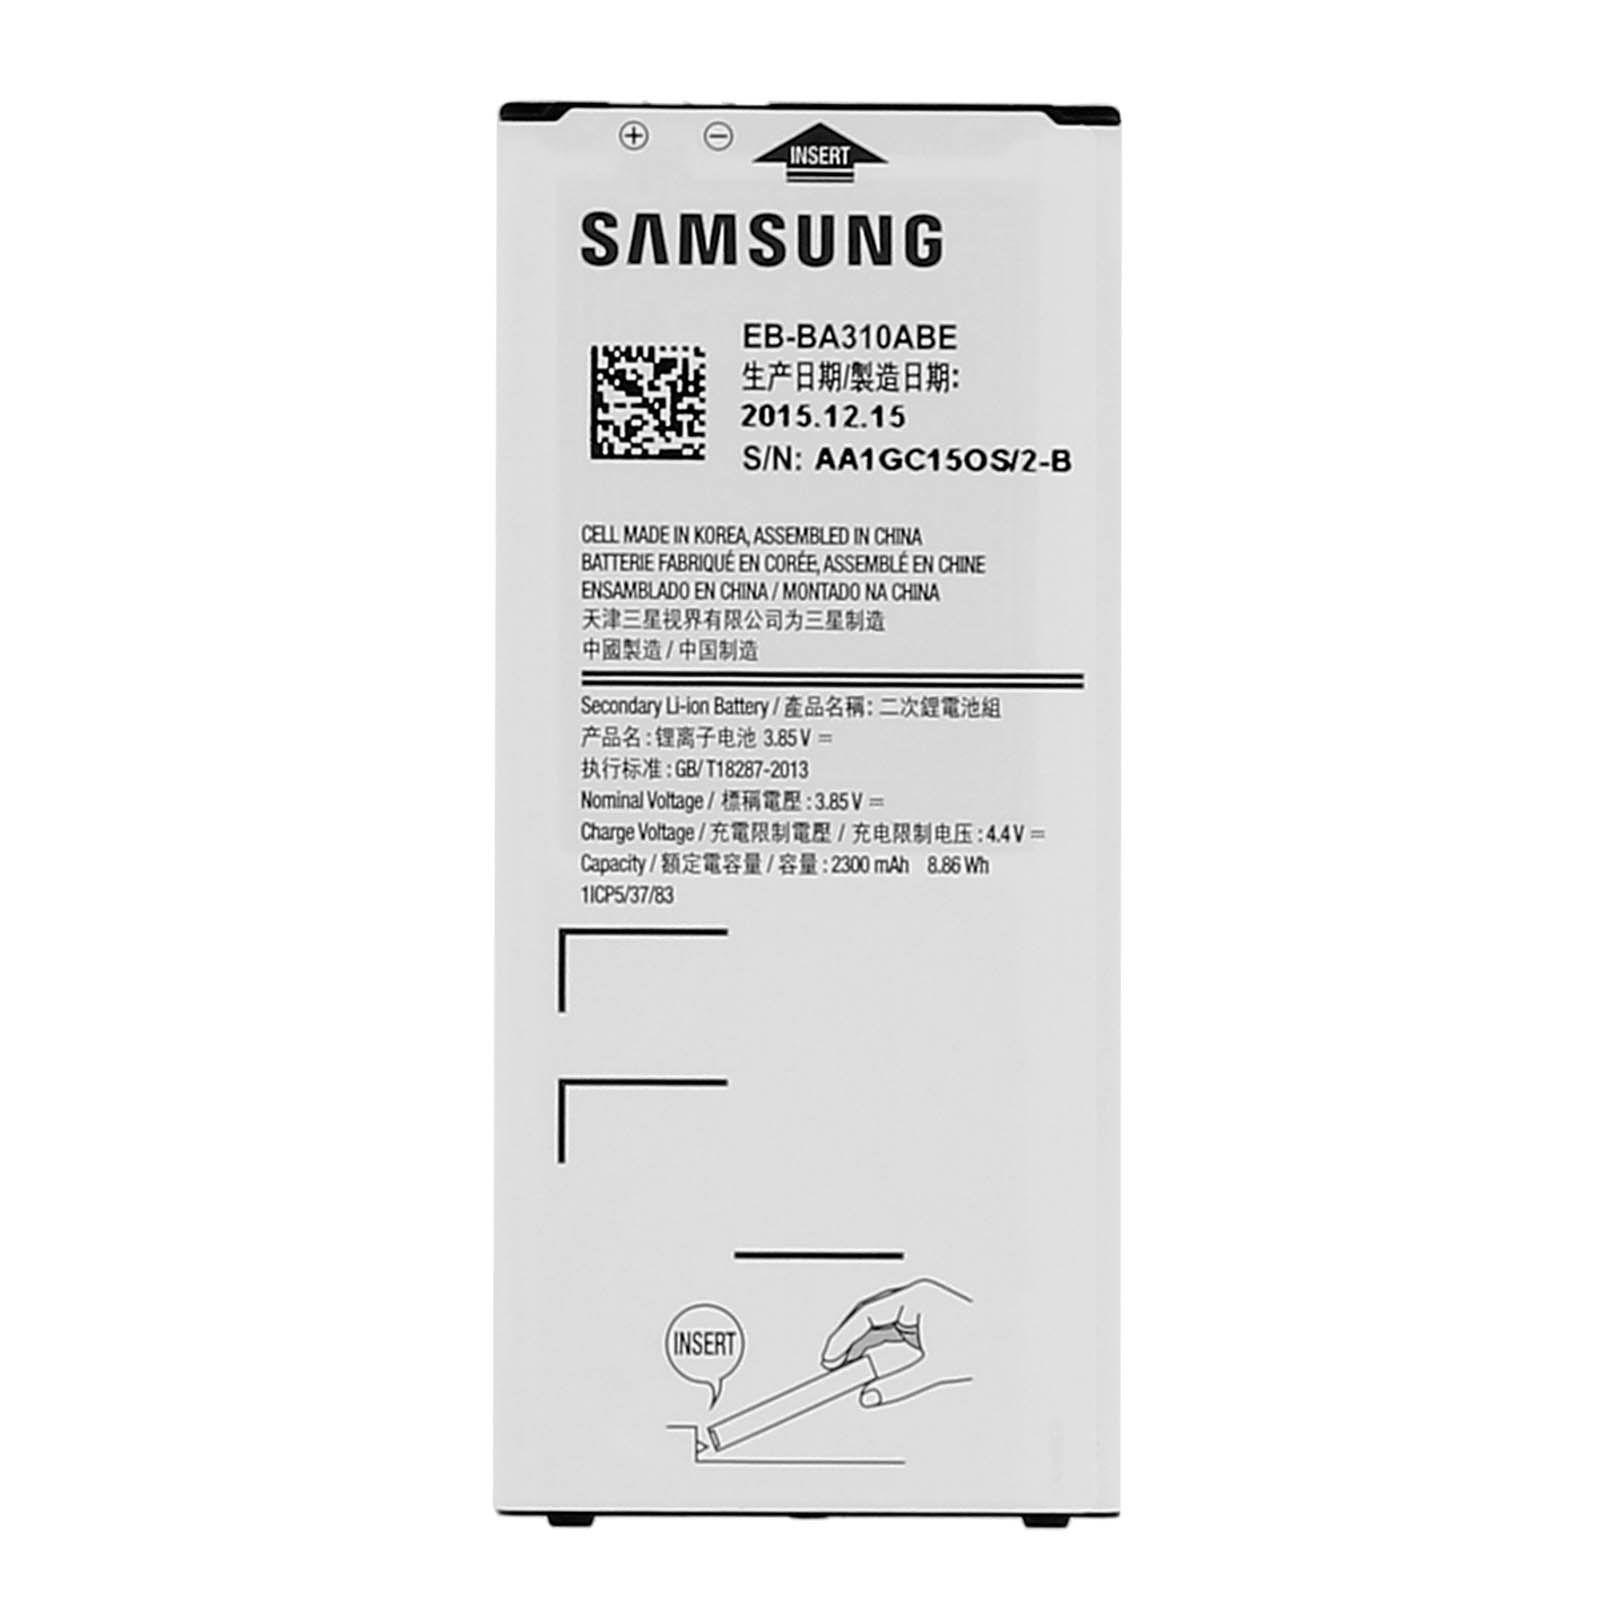 batterie original samsung galaxy a3 2016 samsung eb ba310abe 2300mah. Black Bedroom Furniture Sets. Home Design Ideas